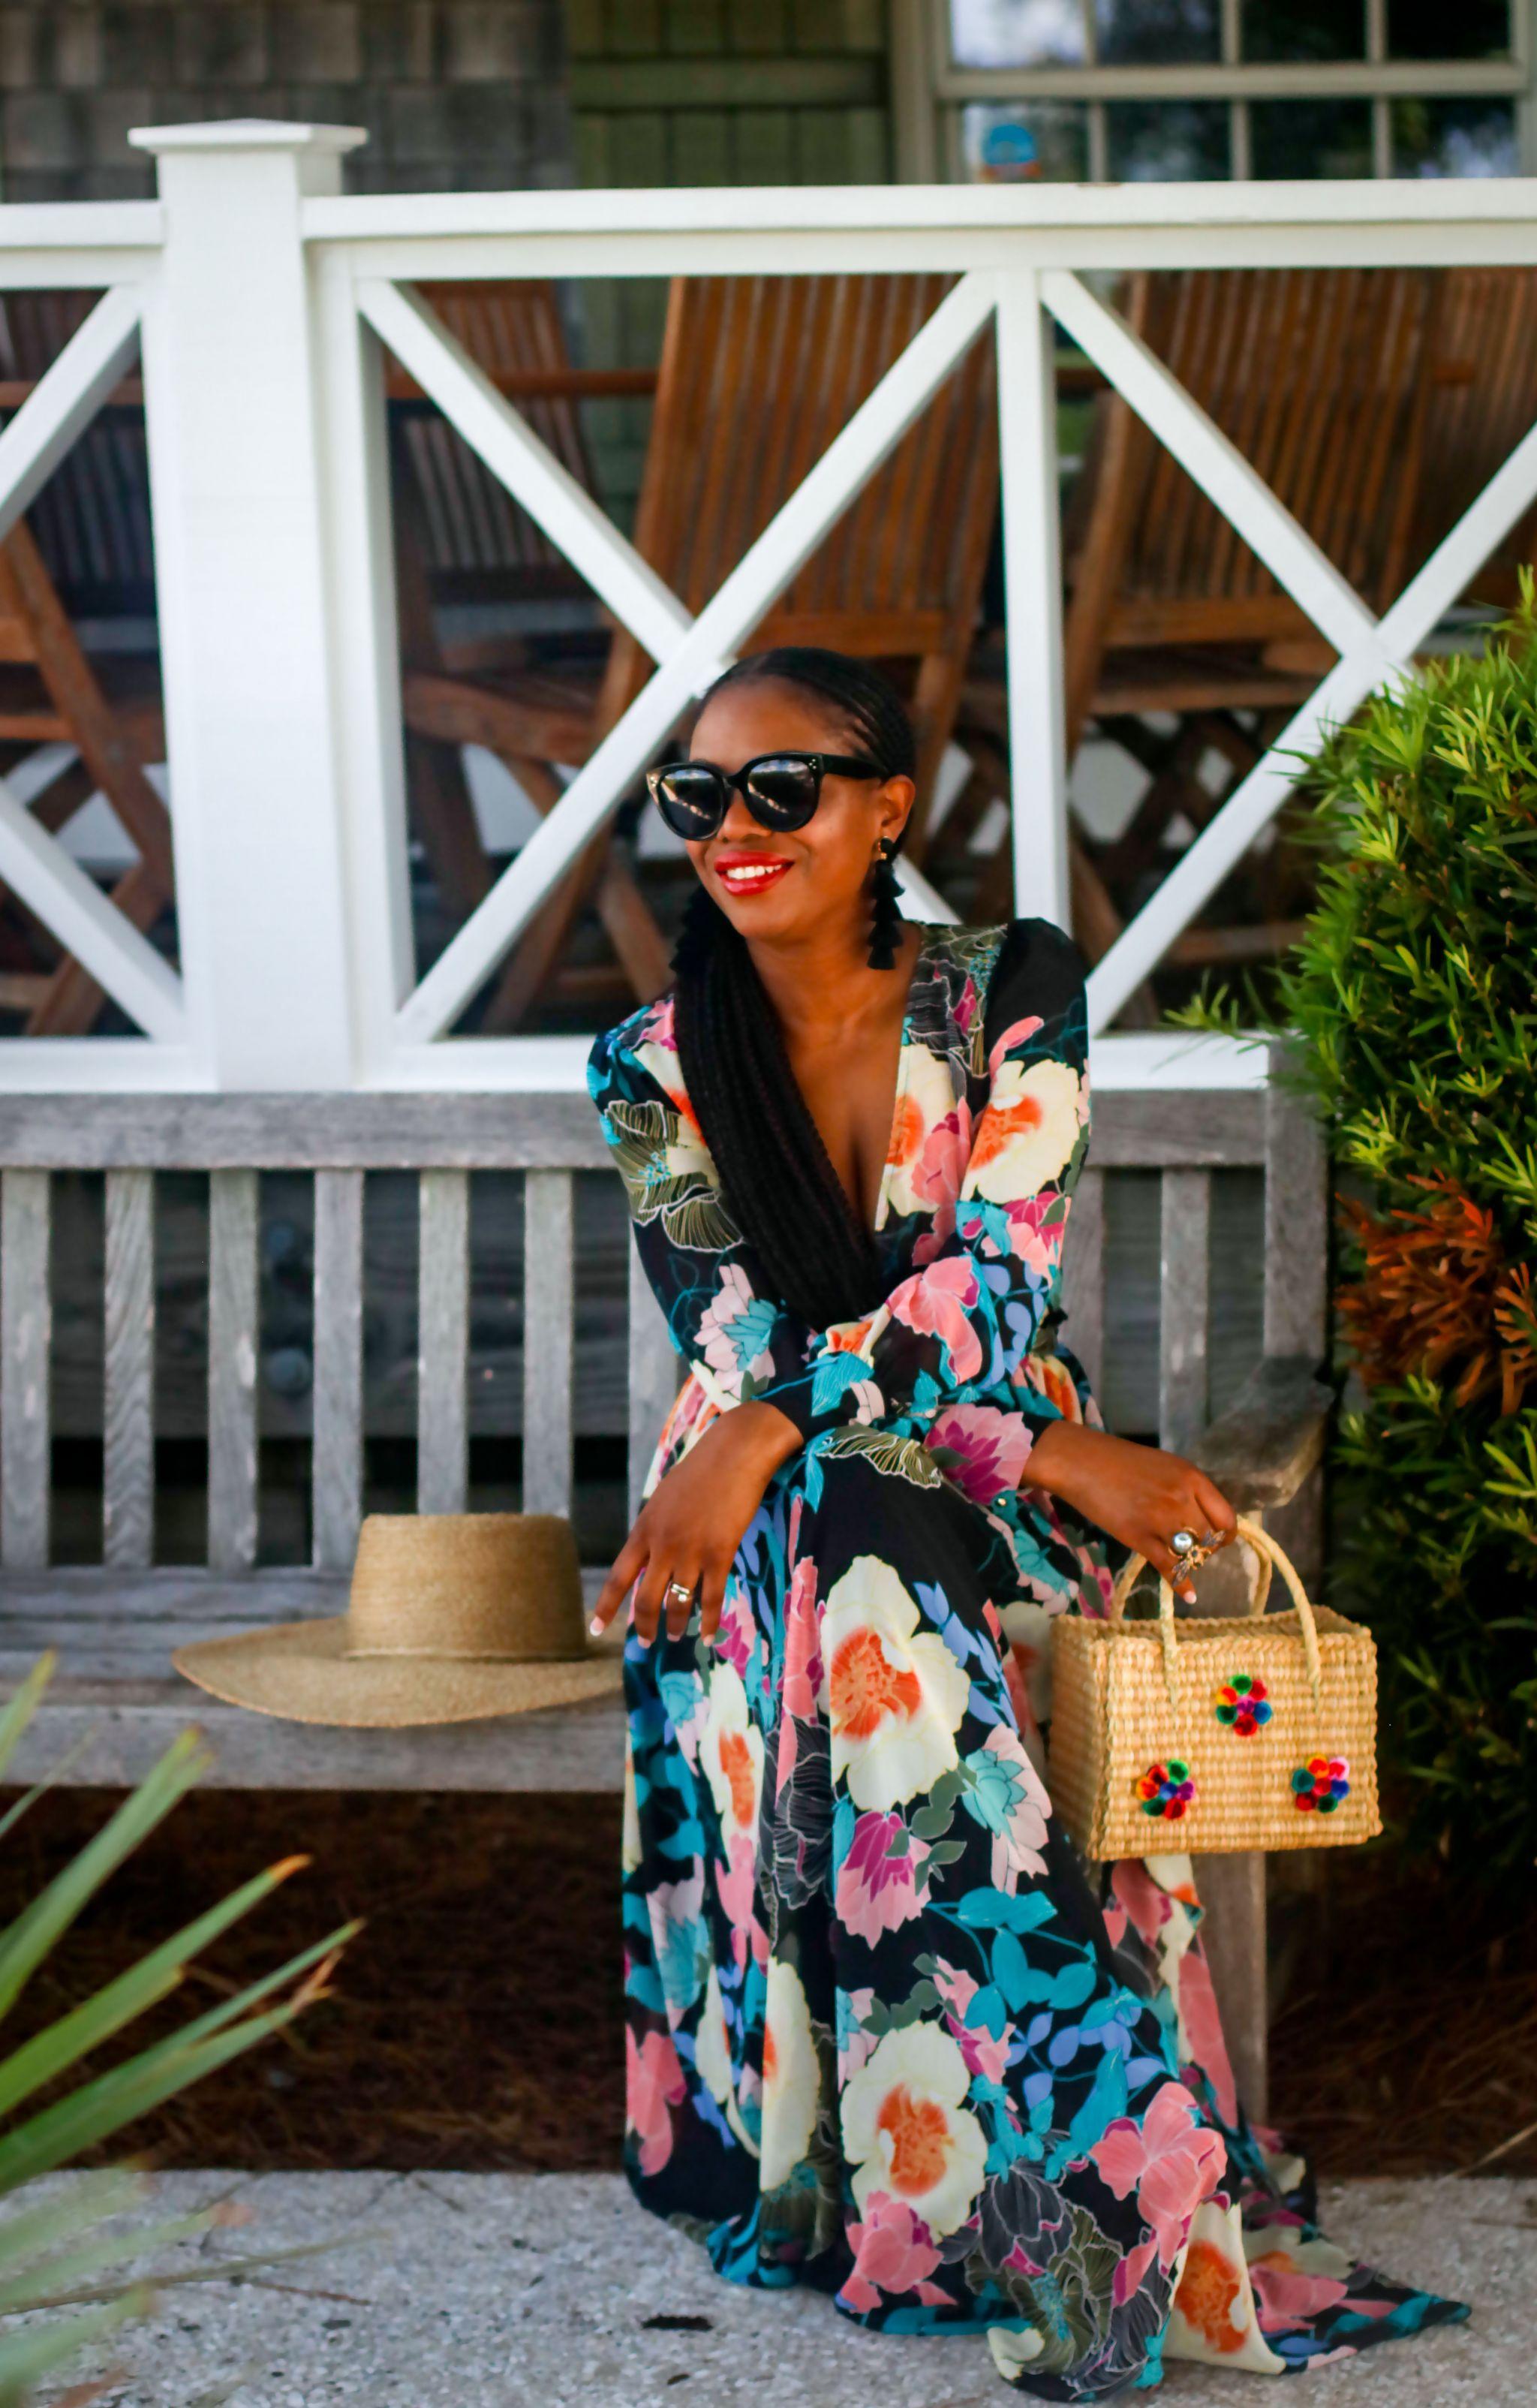 Fashion blogger wearing Maxi dress to the beach.jpg 8